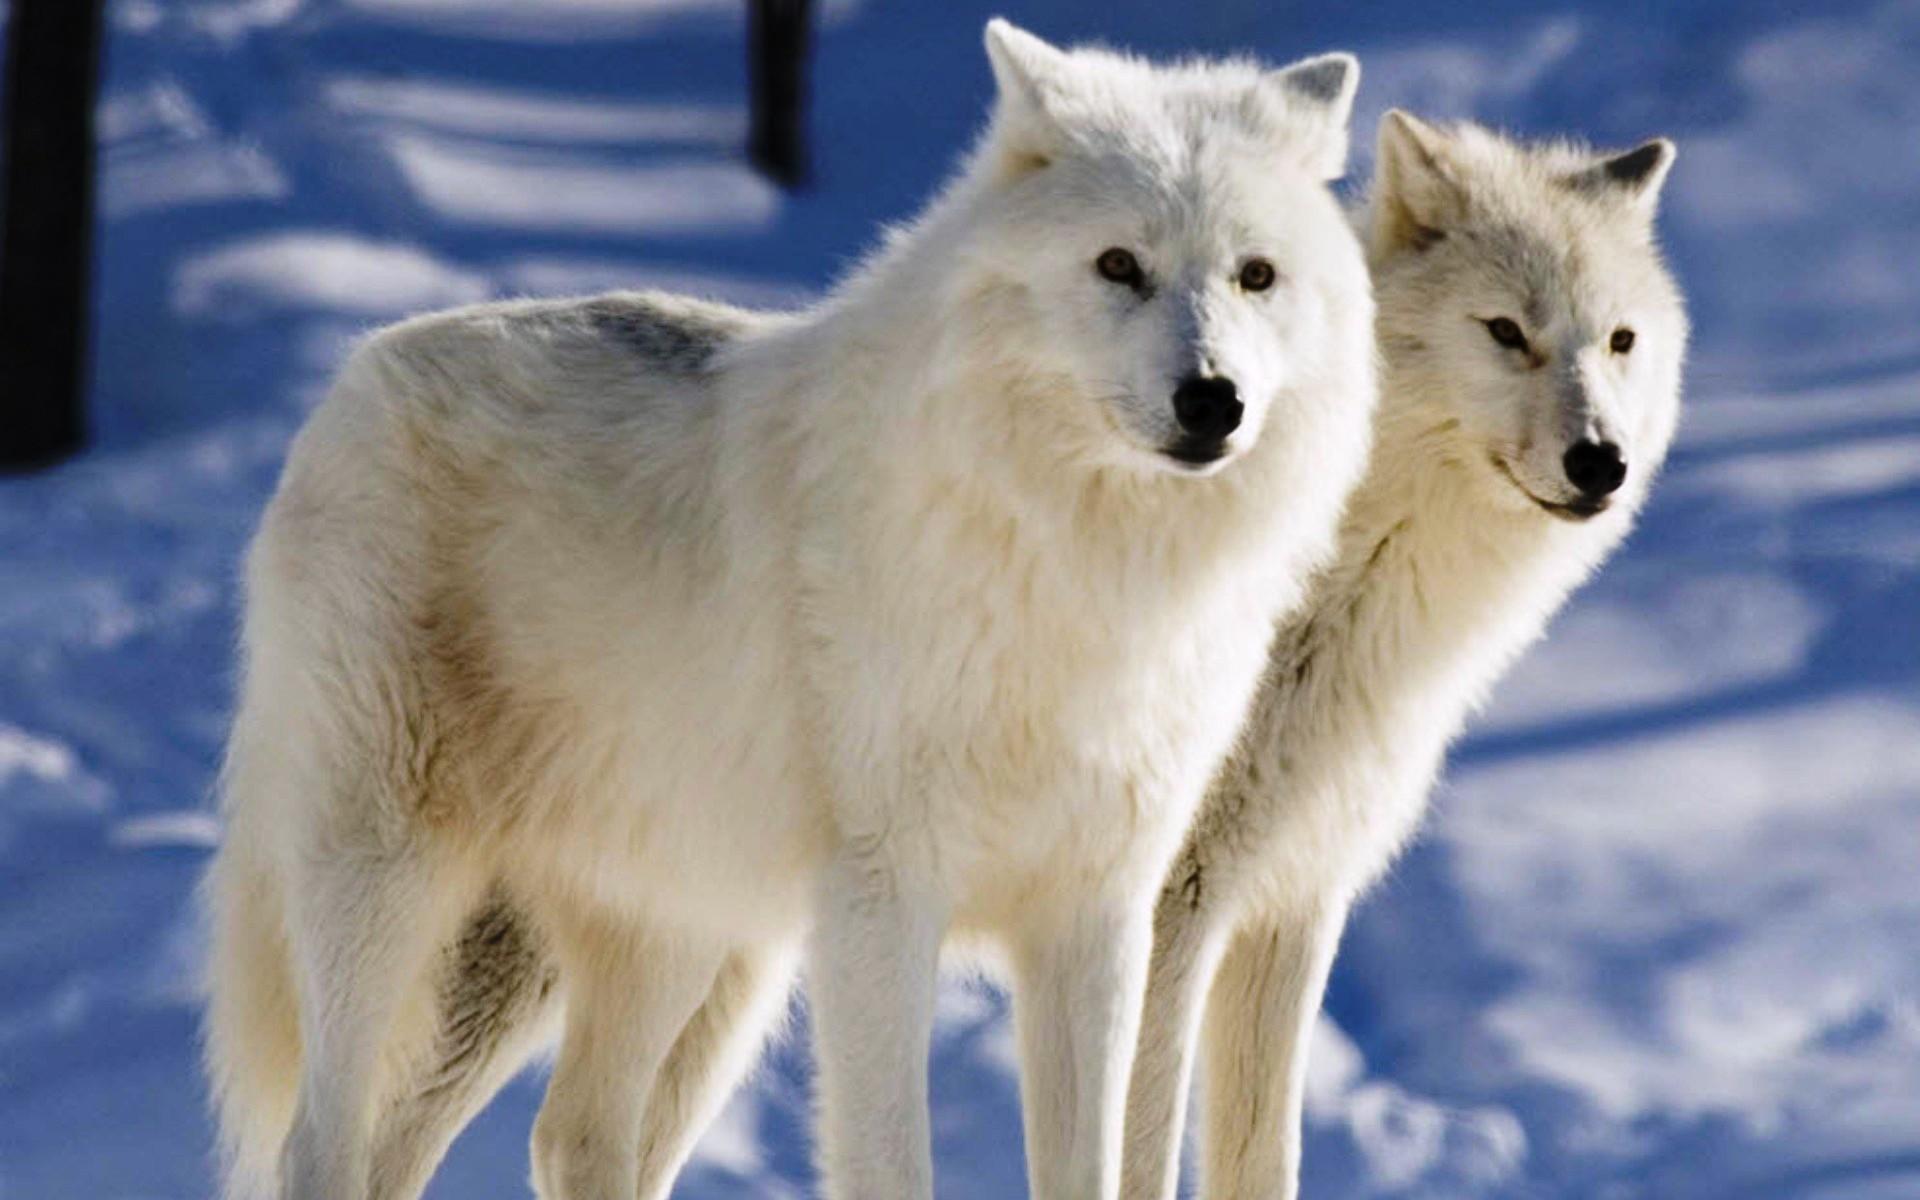 Картинка волки целуются - e3d